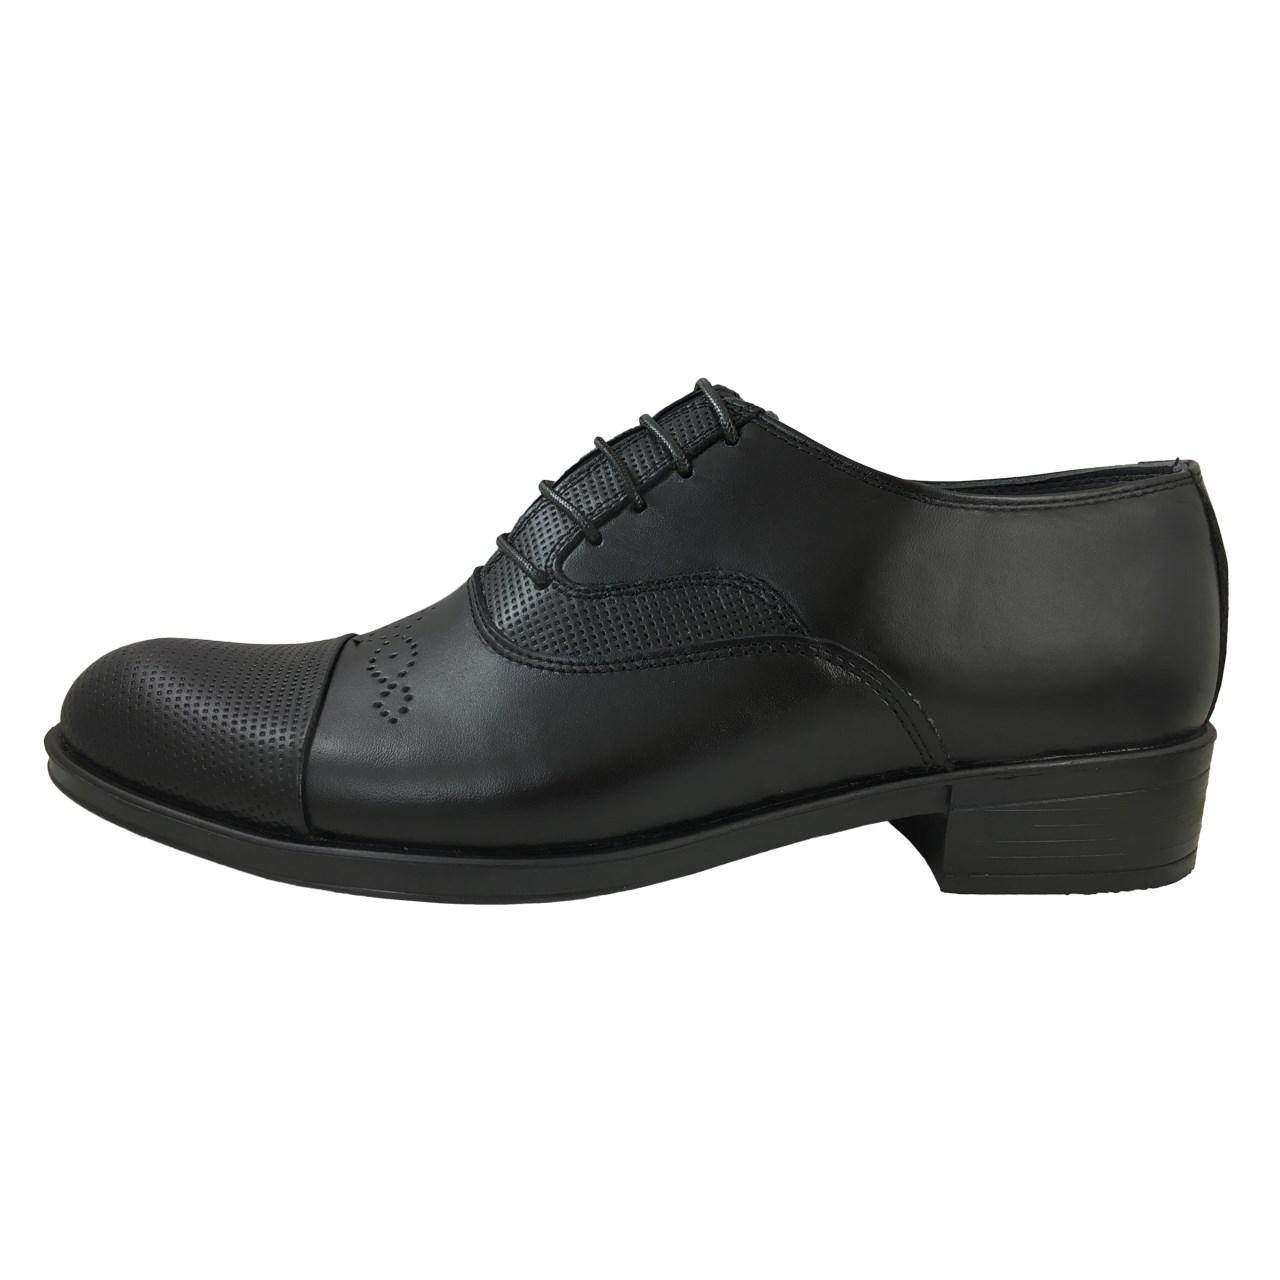 کفش  چرم طبیعی مردانه پای آرا مدل 3037 کد 2205